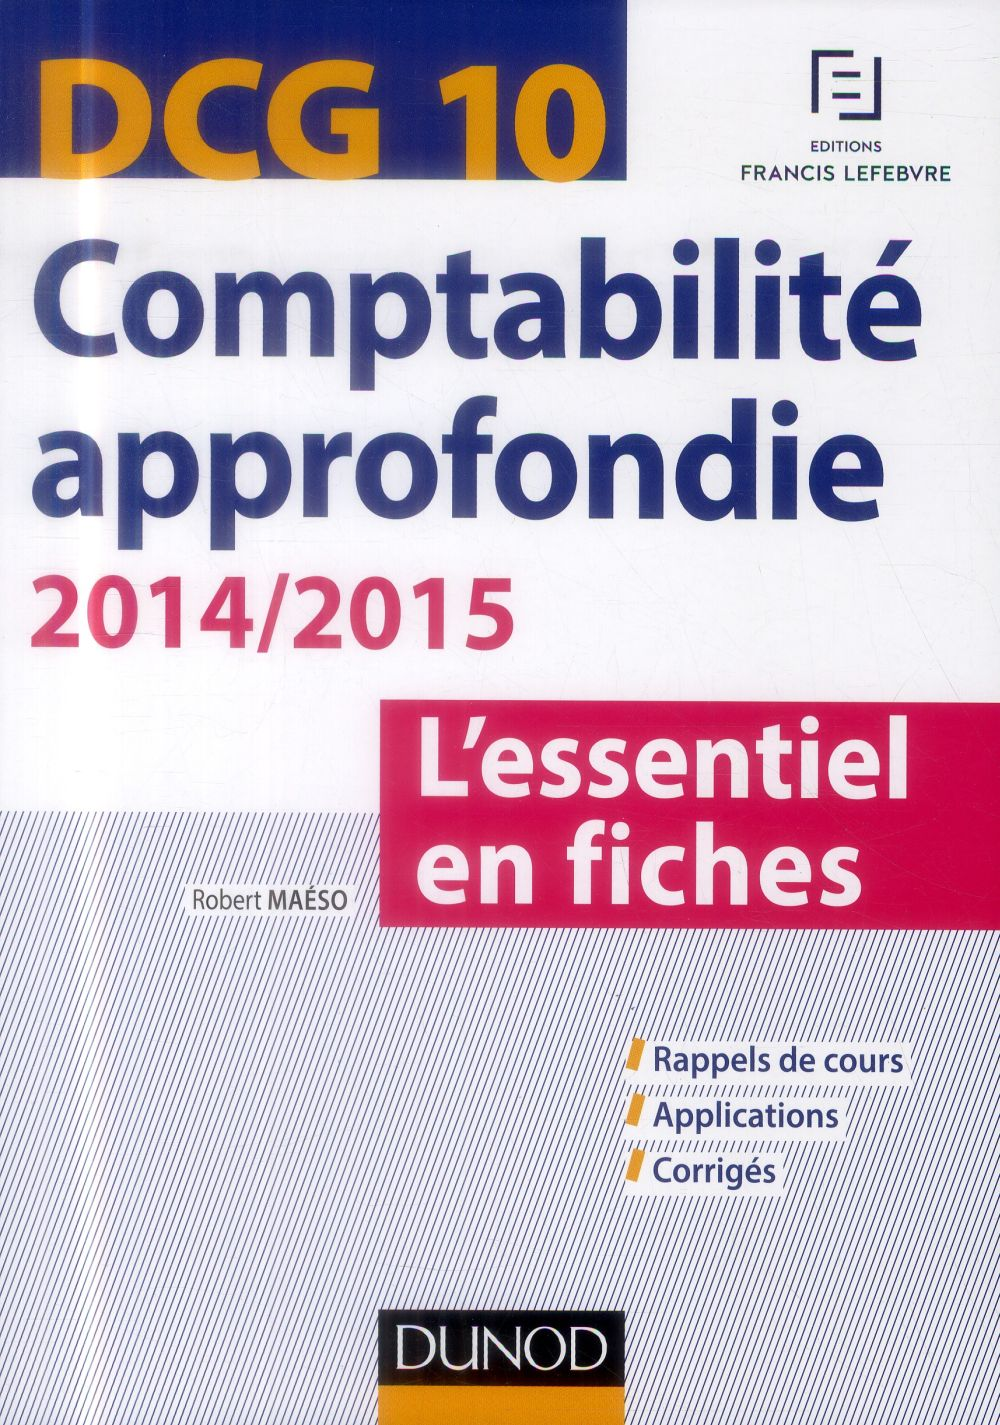 Dcg 10 ; Comptabilite Approfondie ; L'Essentiel En Fiches ; 4e Edition